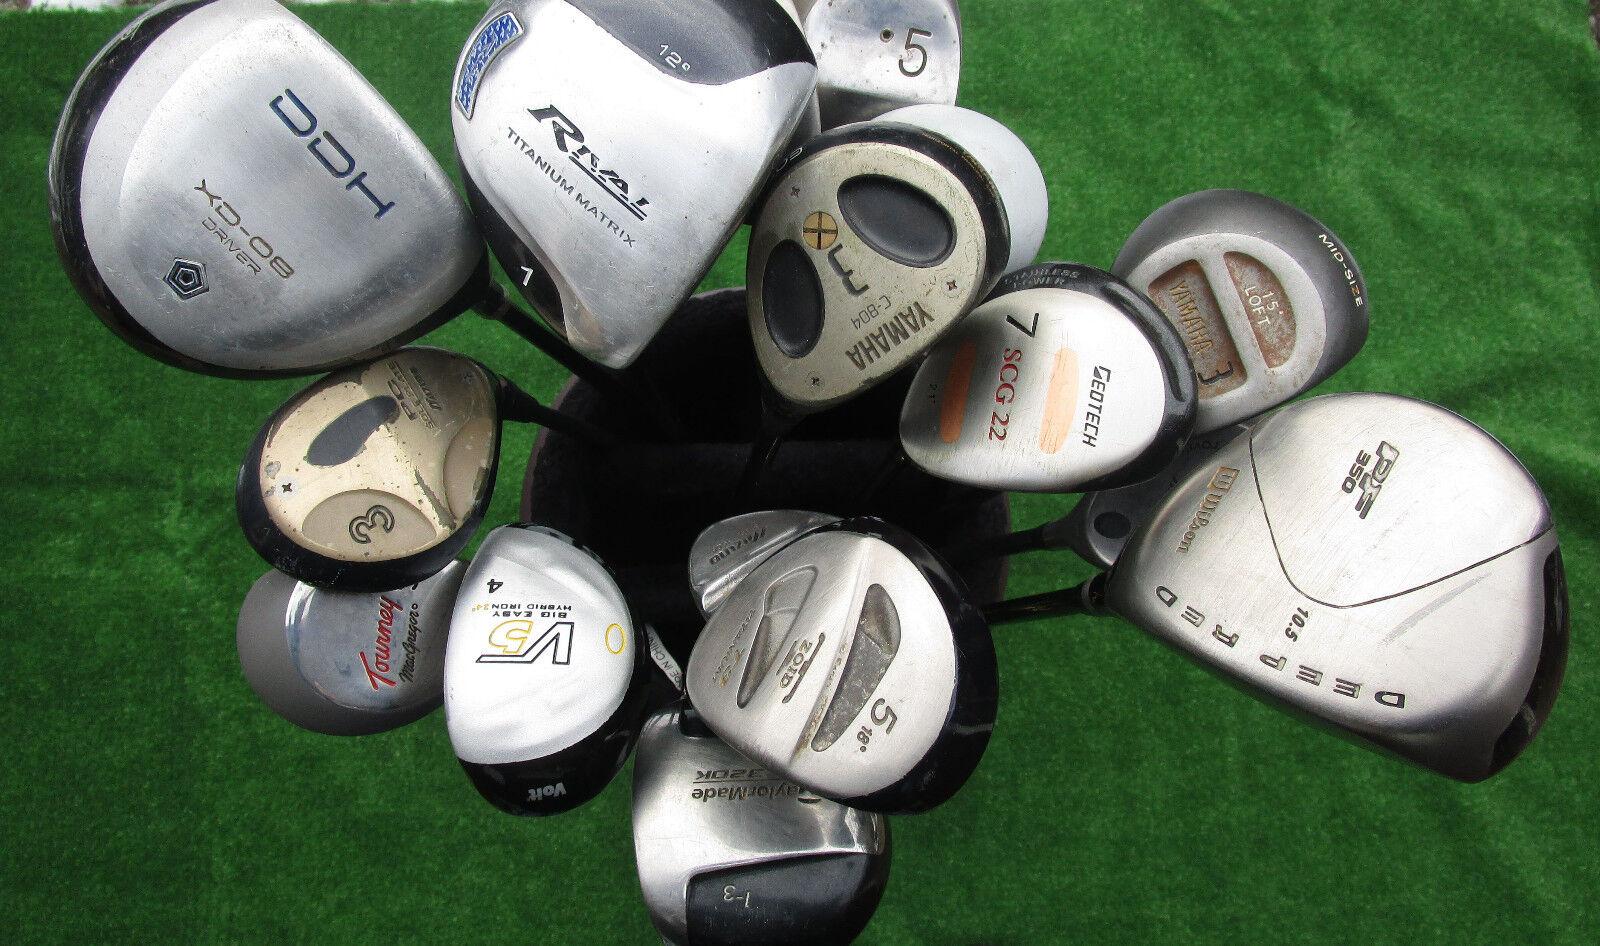 Golfschläger Crossgolfschläger Holz 1 Holz 3 Holz 4 Holz 5 Holz 7 auswählbar